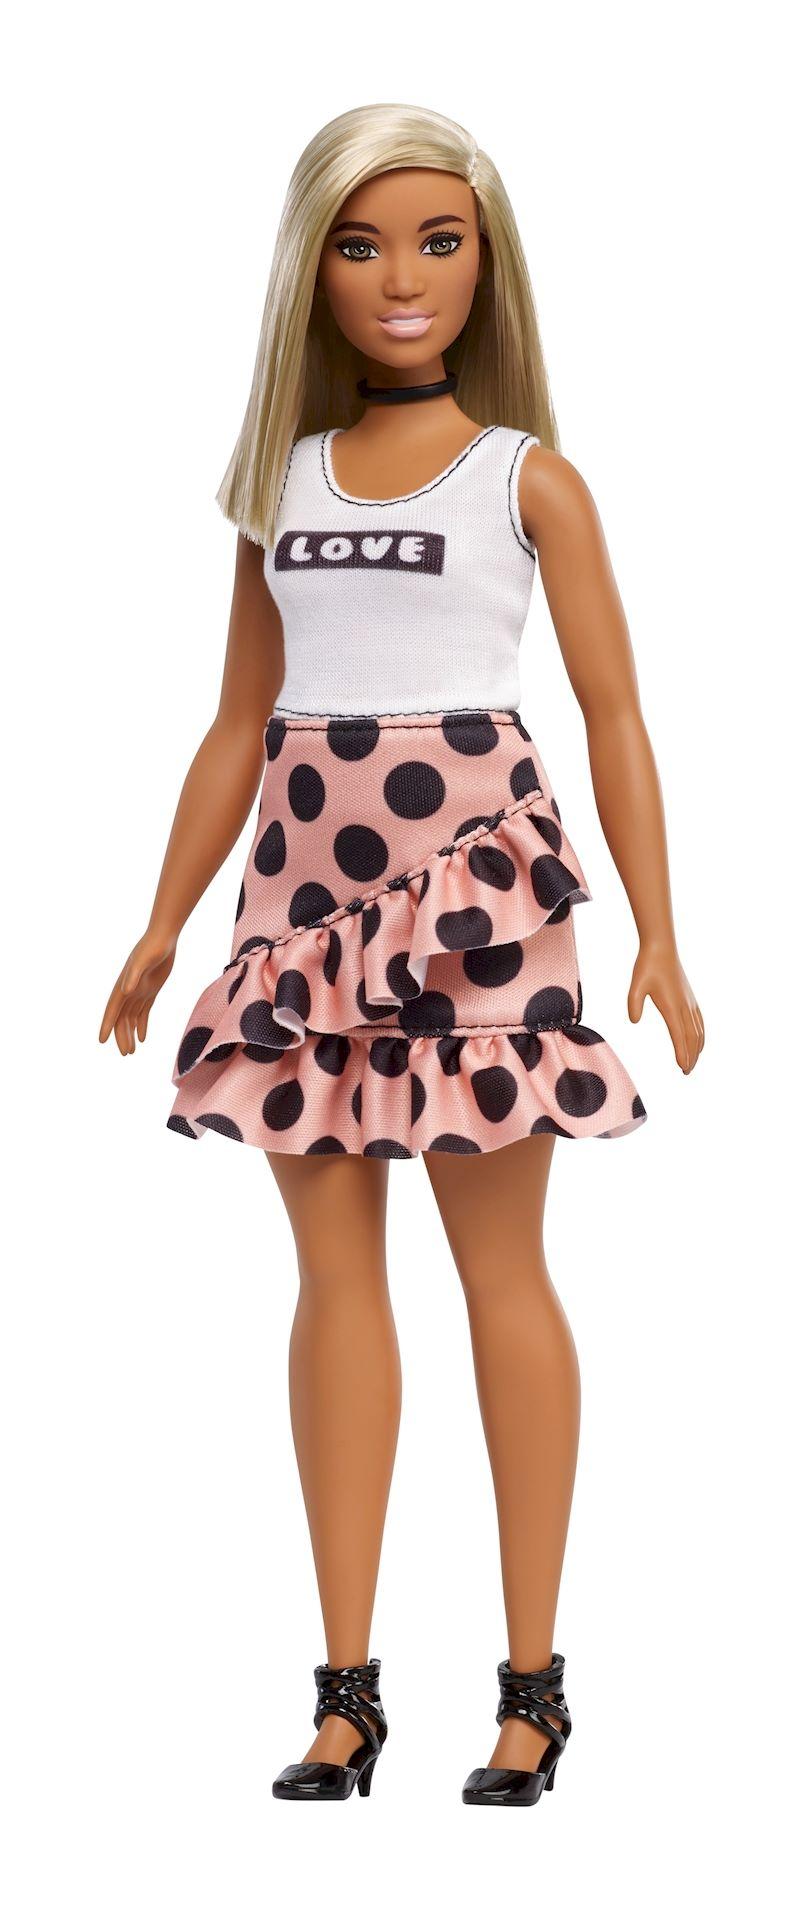 Barbie Fashionistas - 111